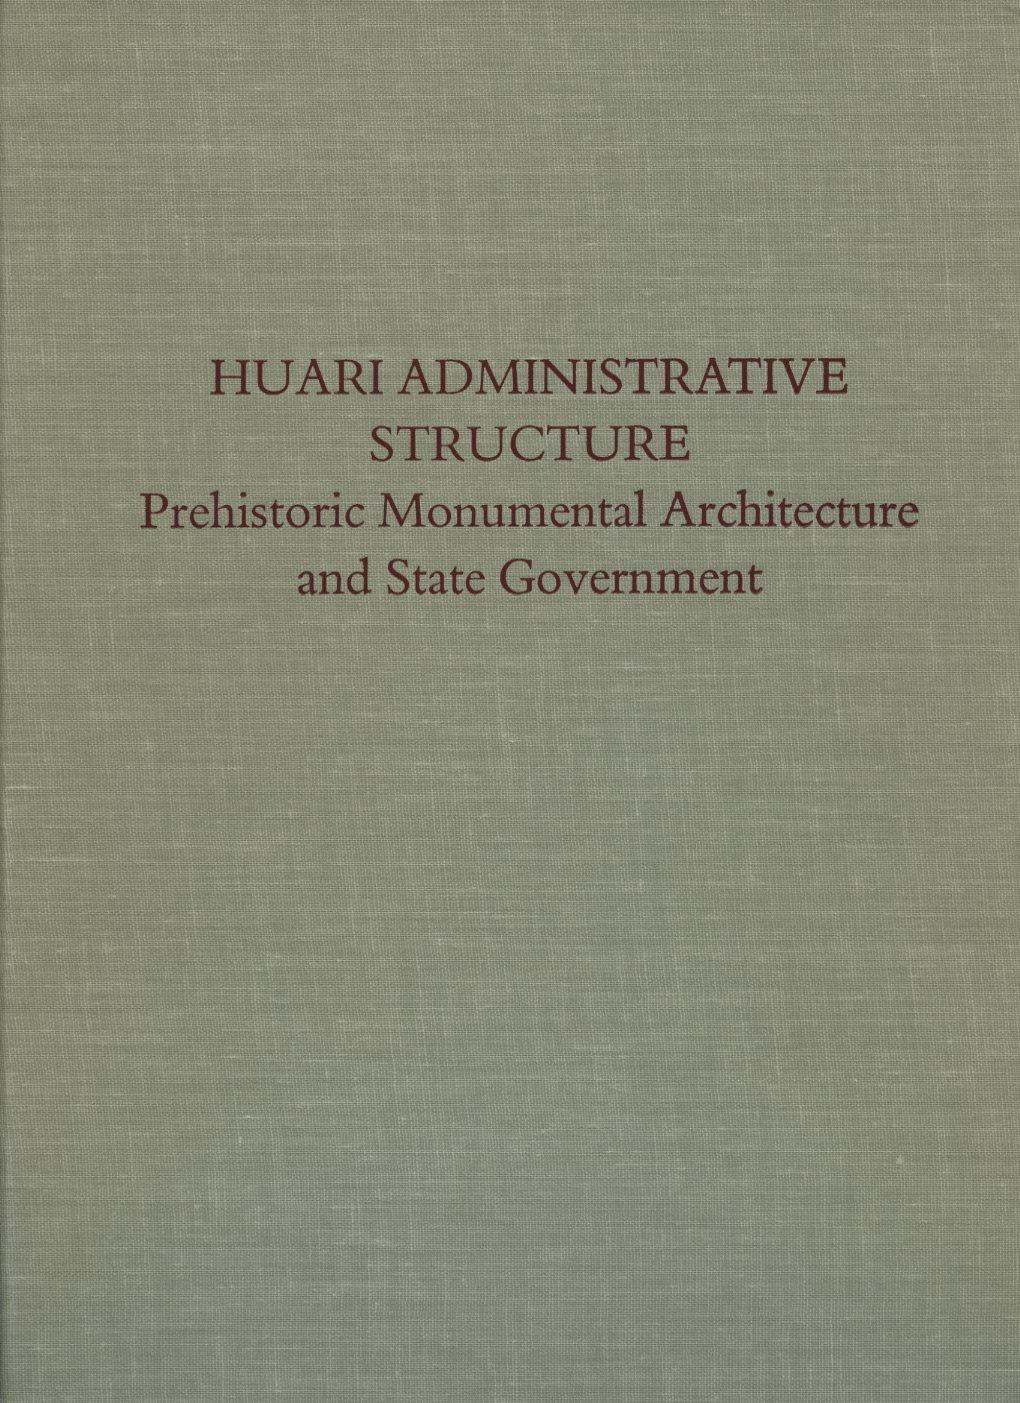 Huari Administrative Structure